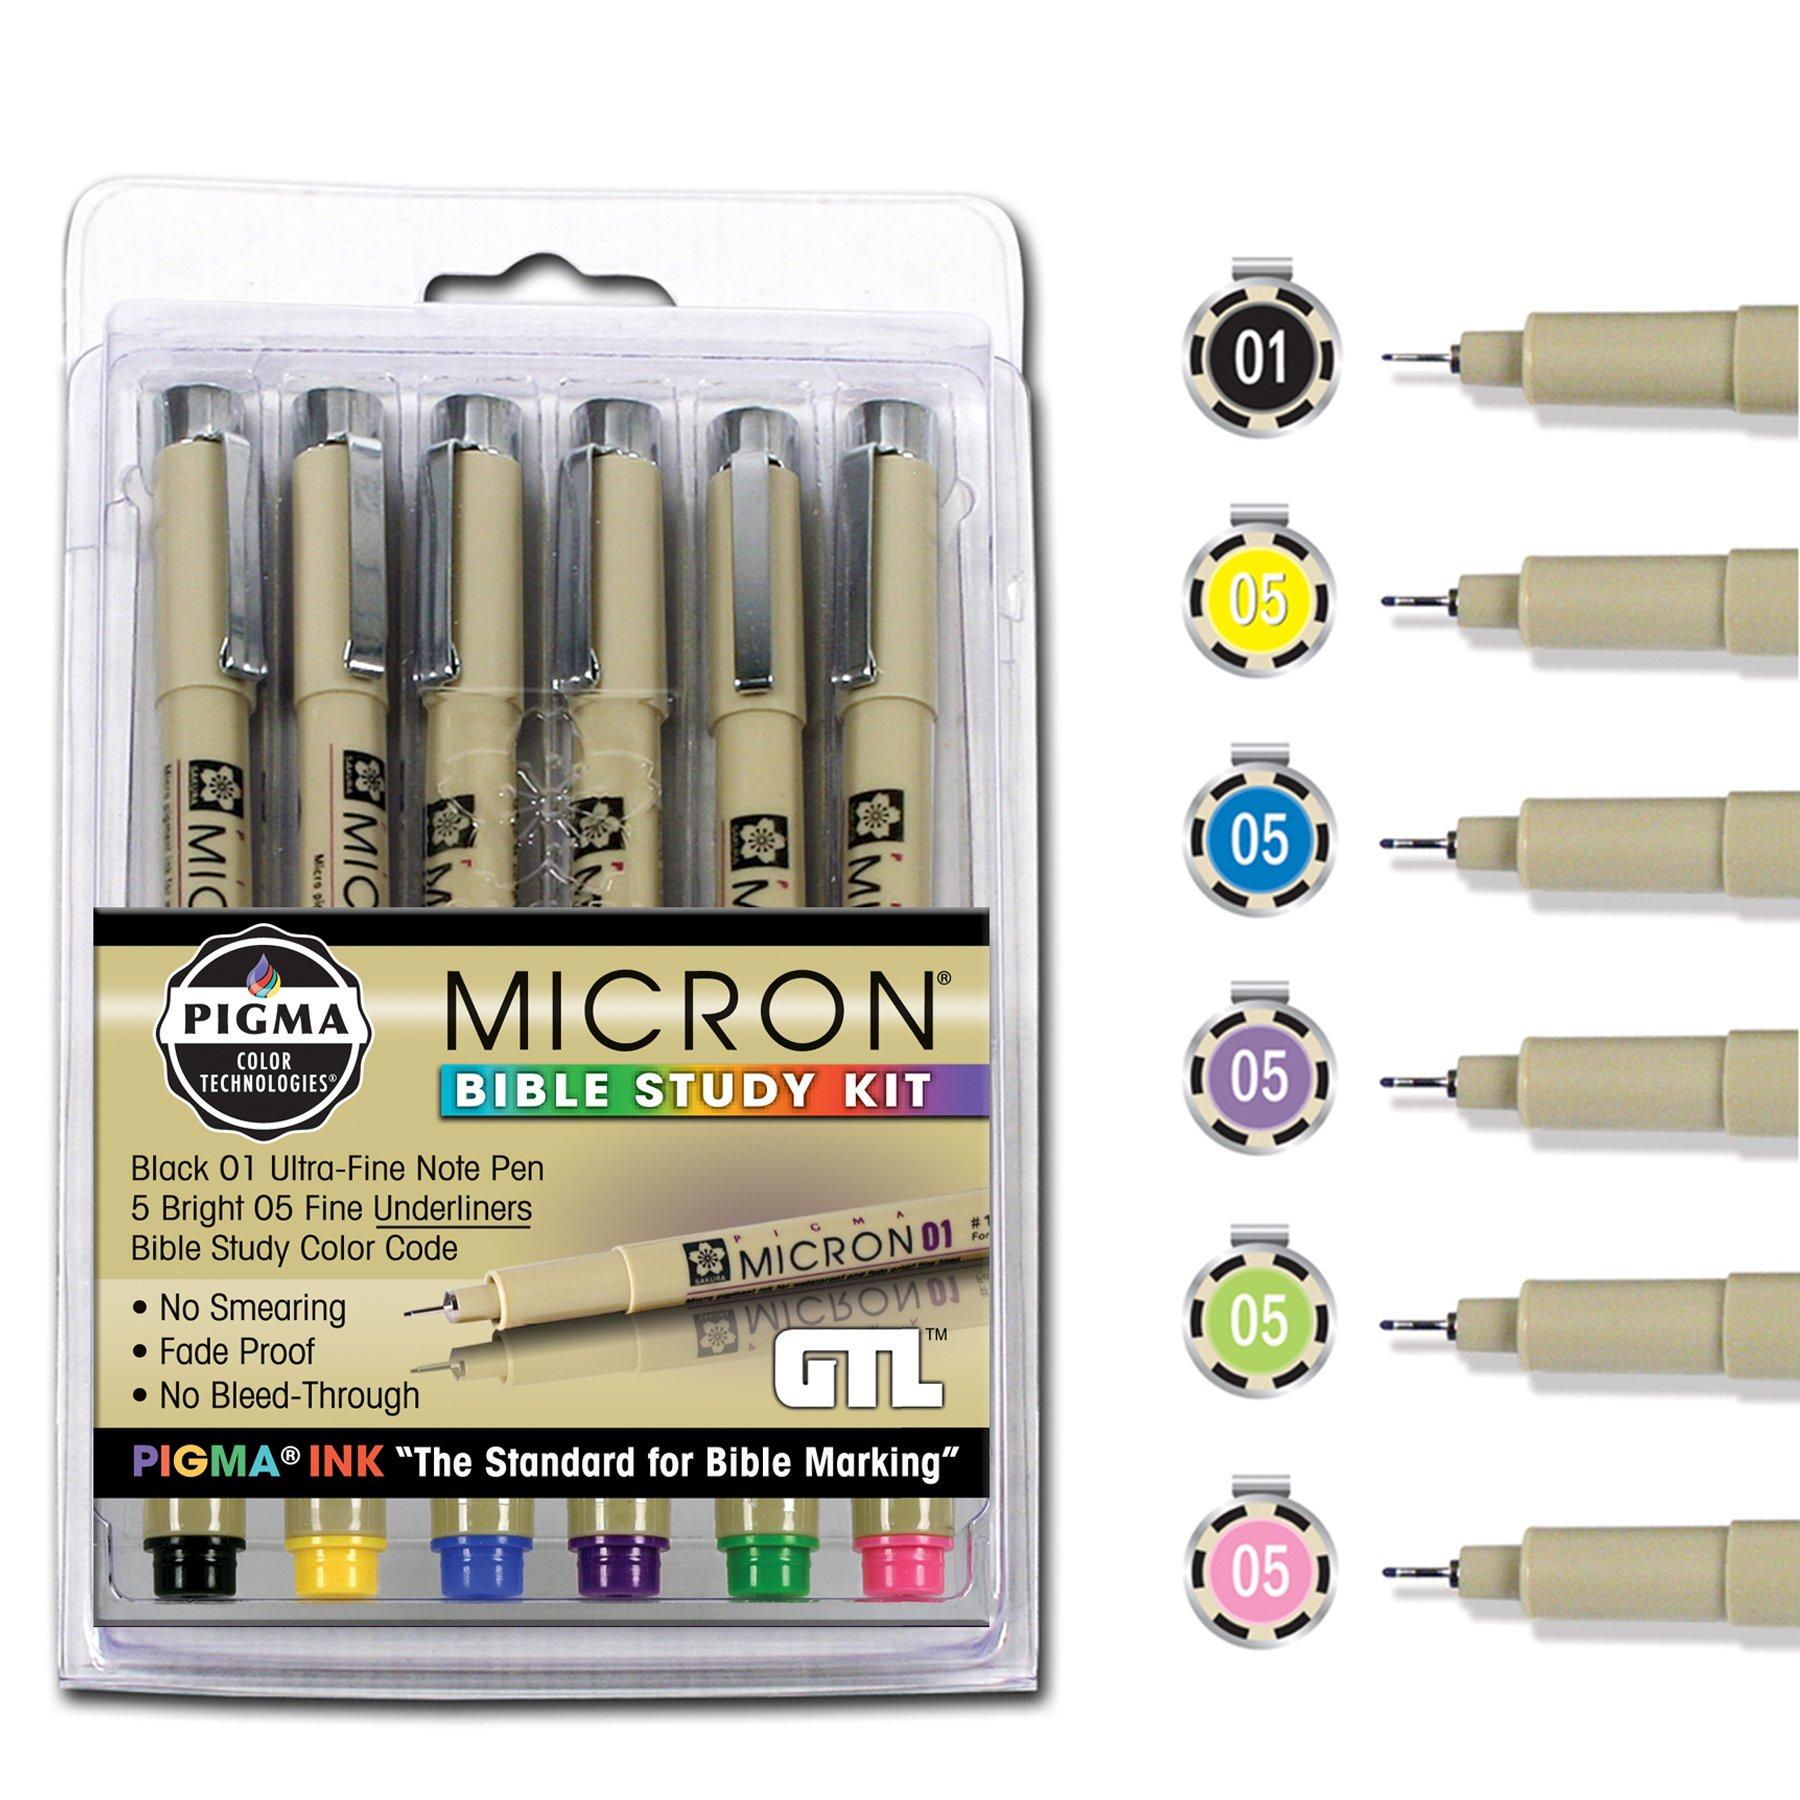 6 x Pigma Micron 01 Fine